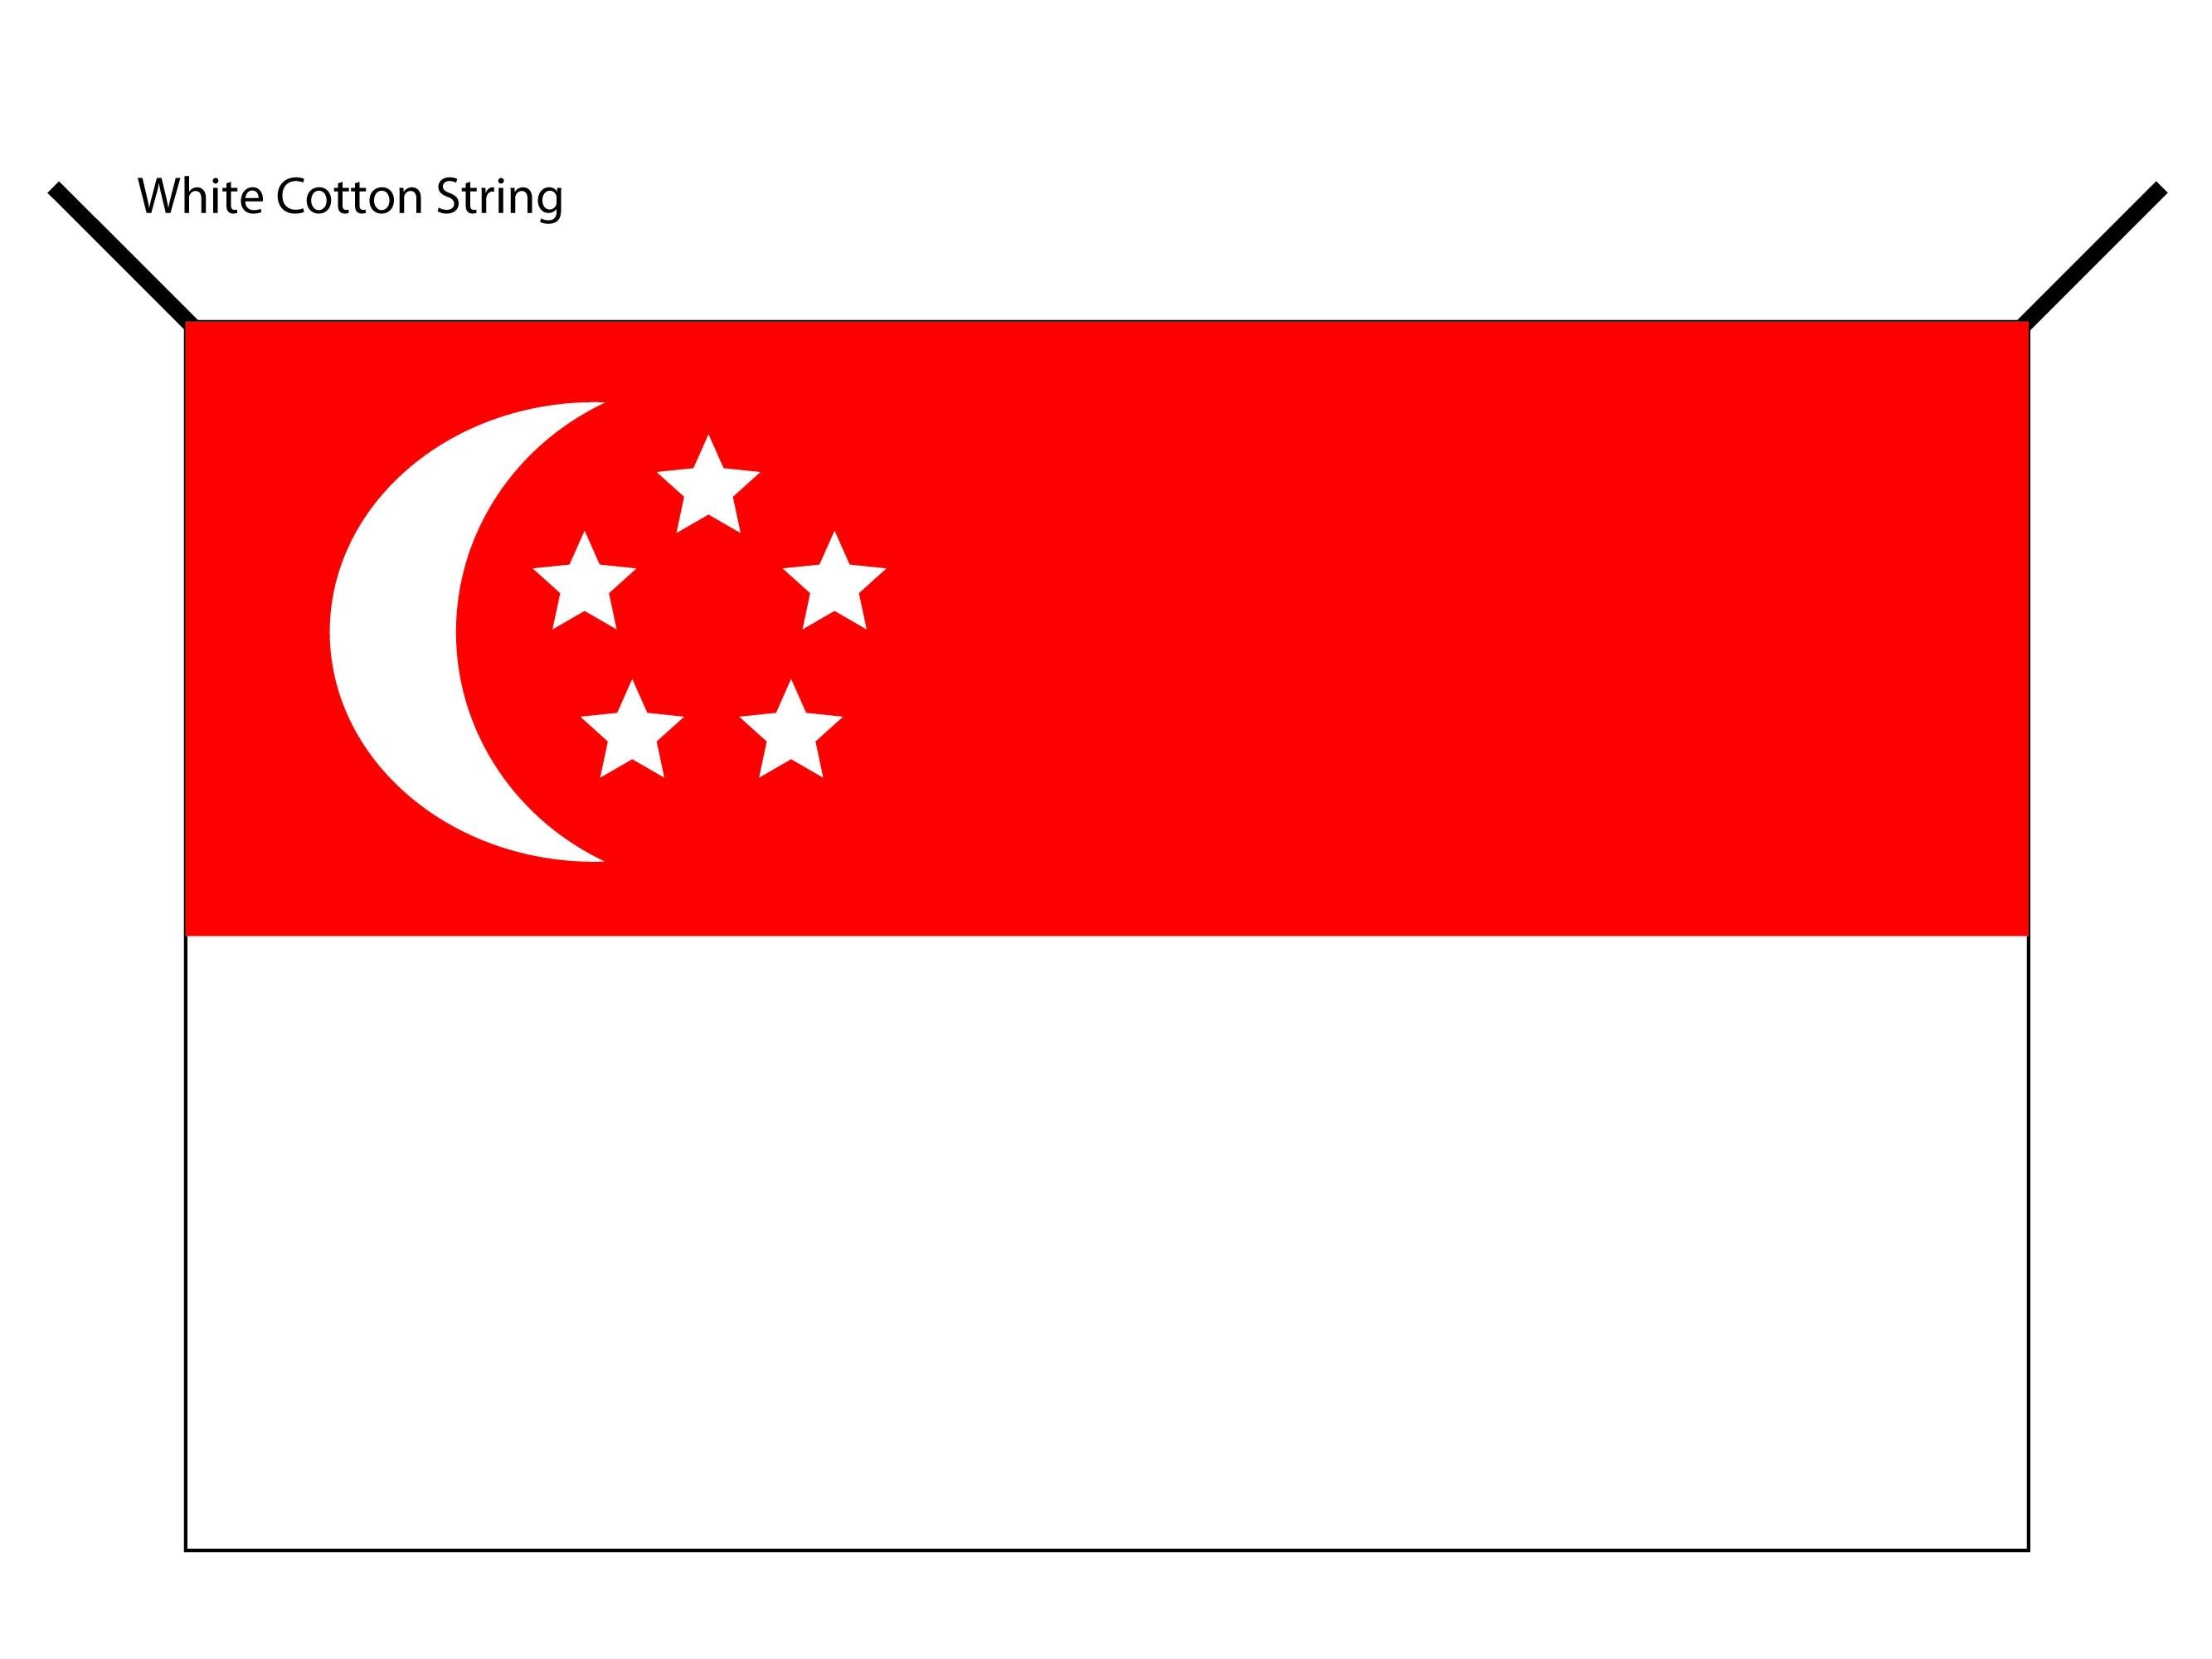 Singapore HDB Flag